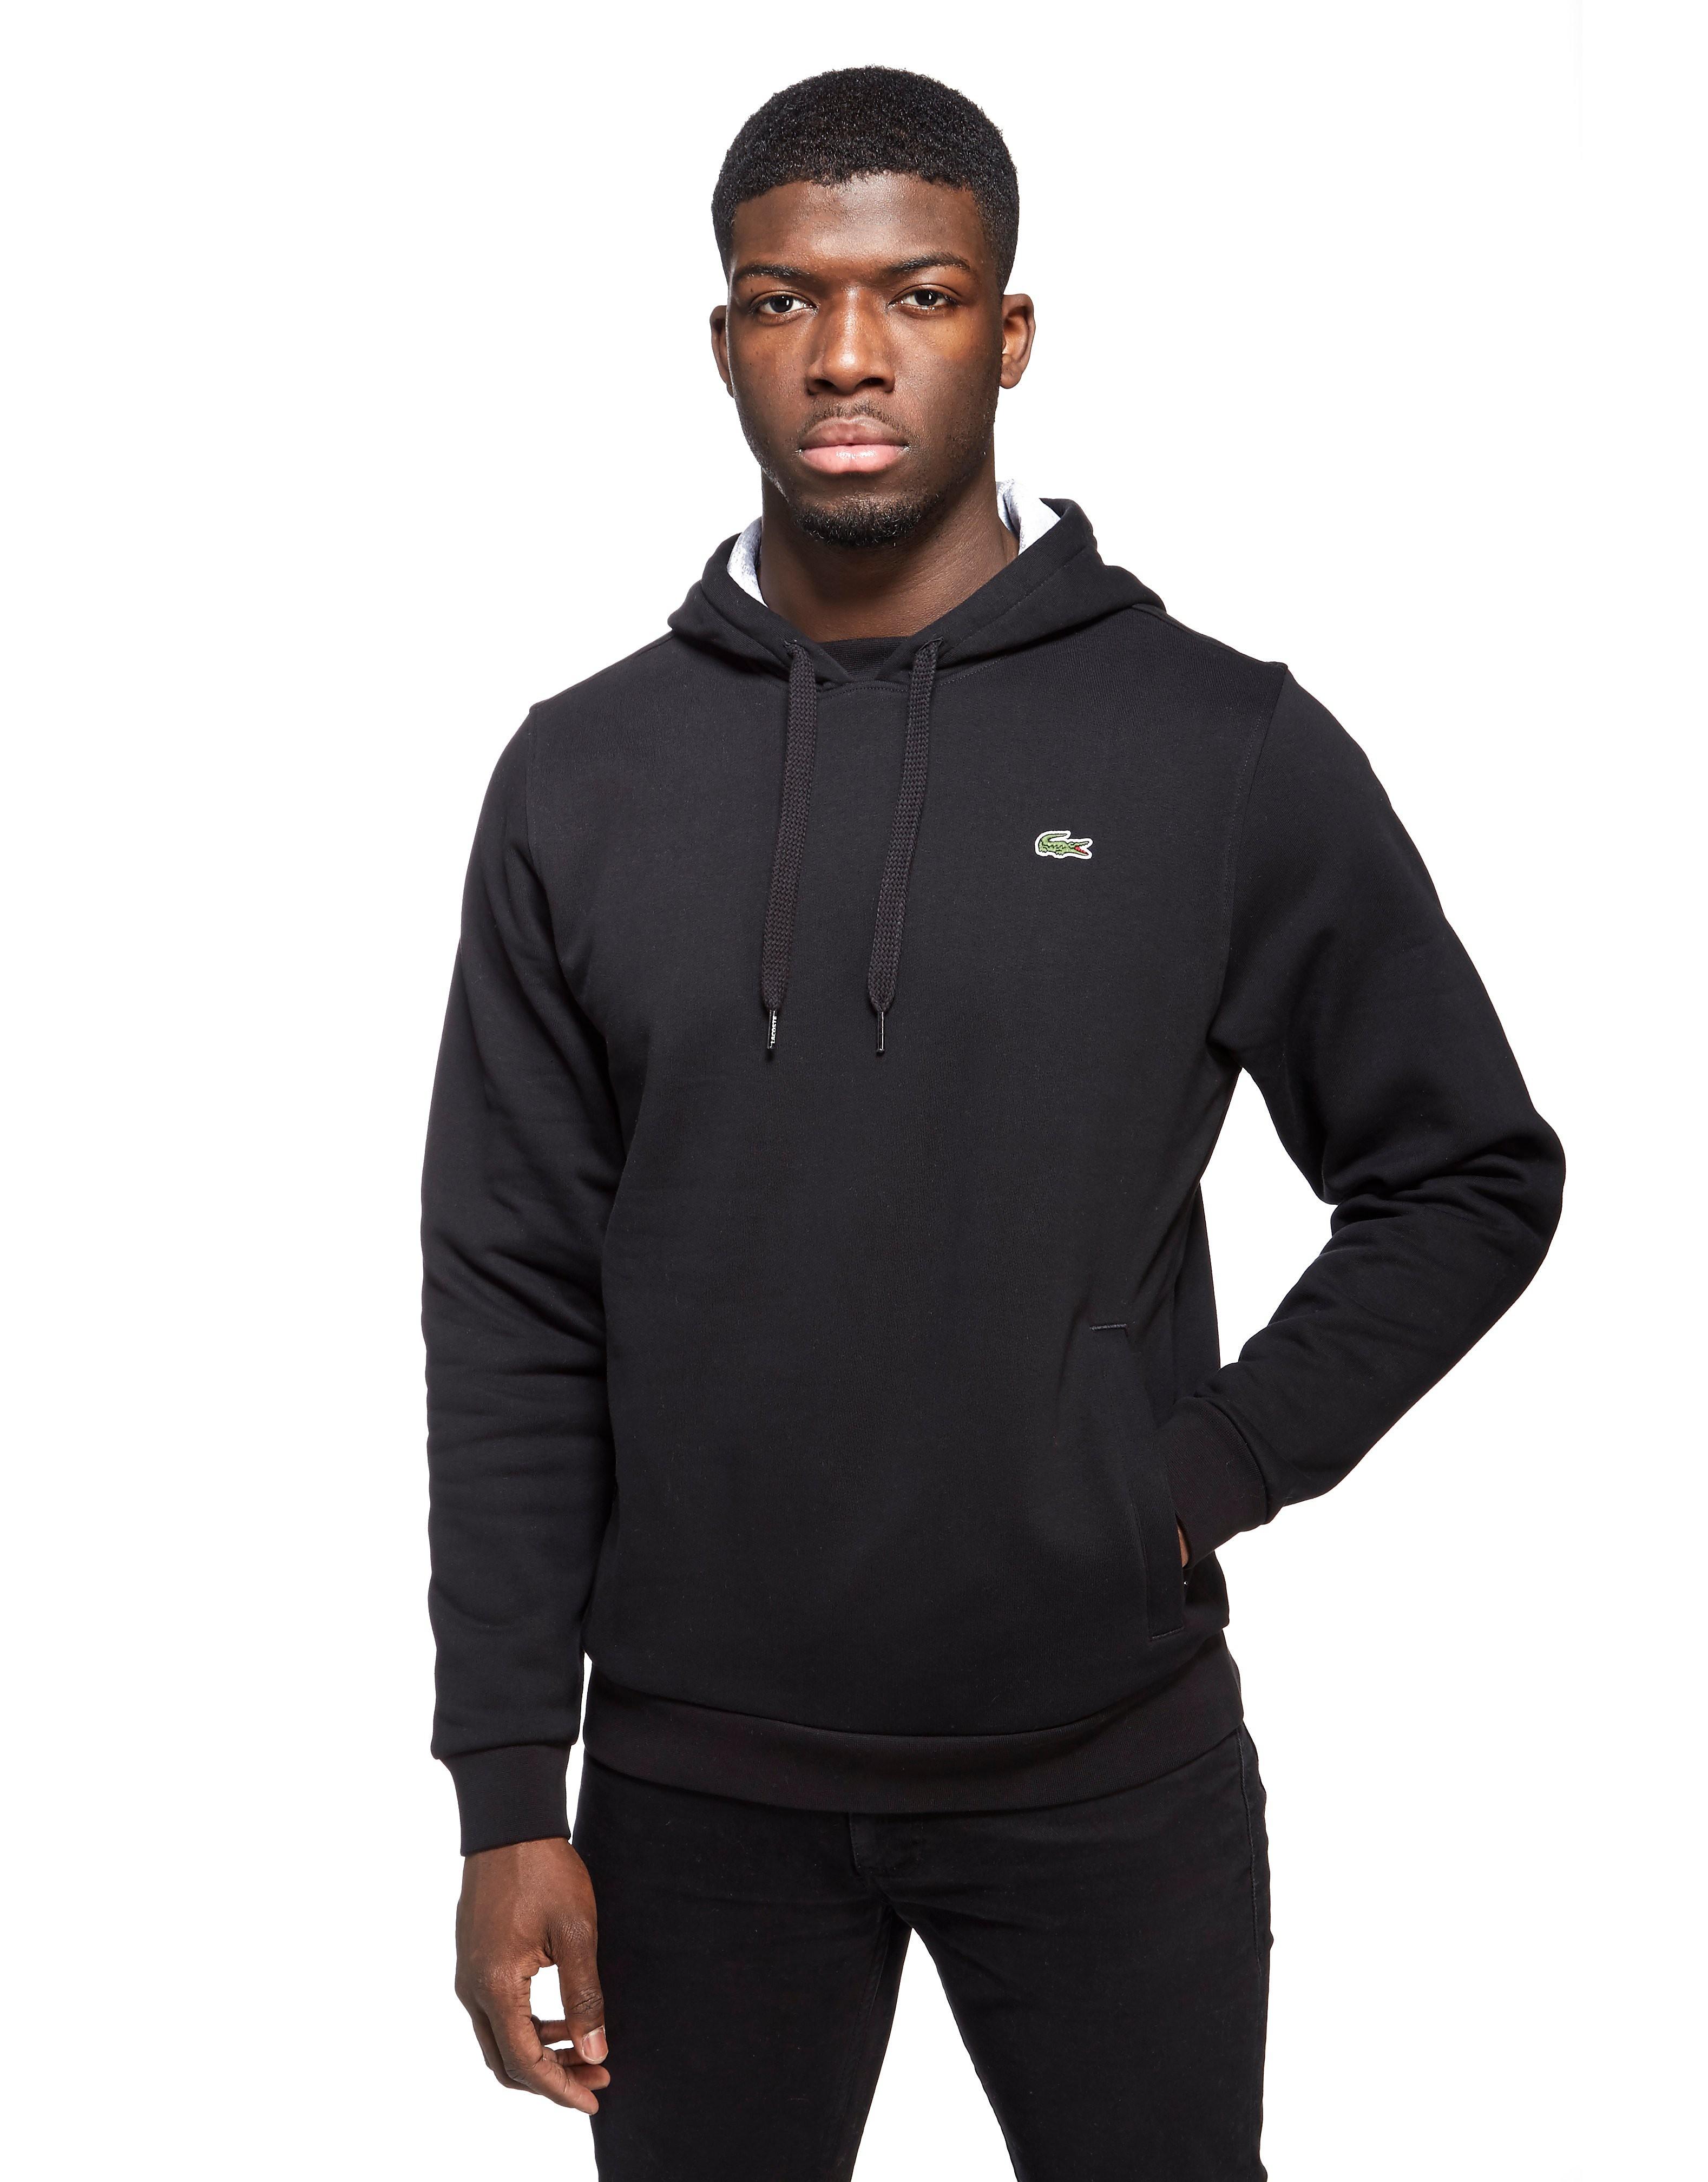 Lacoste Premium Fleece Hoody